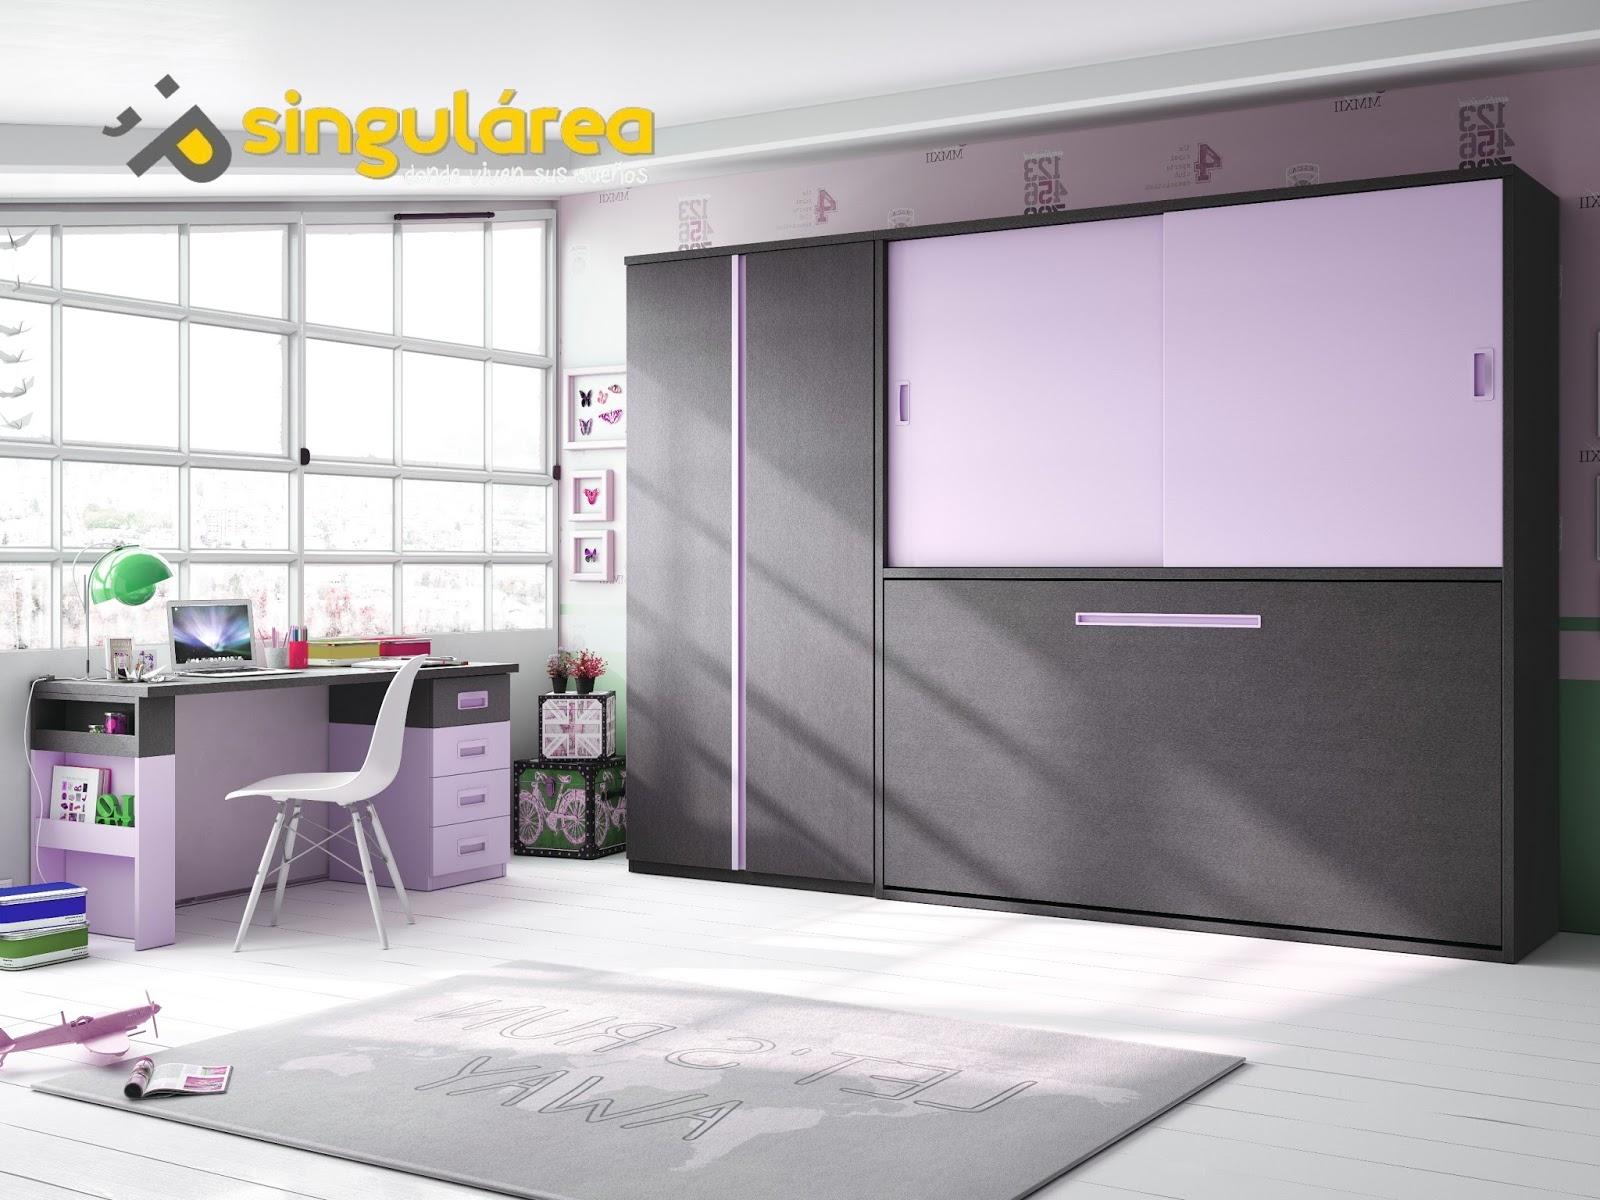 Cama abatible horizontal 861 - Habitaciones juveniles camas abatibles horizontales ...